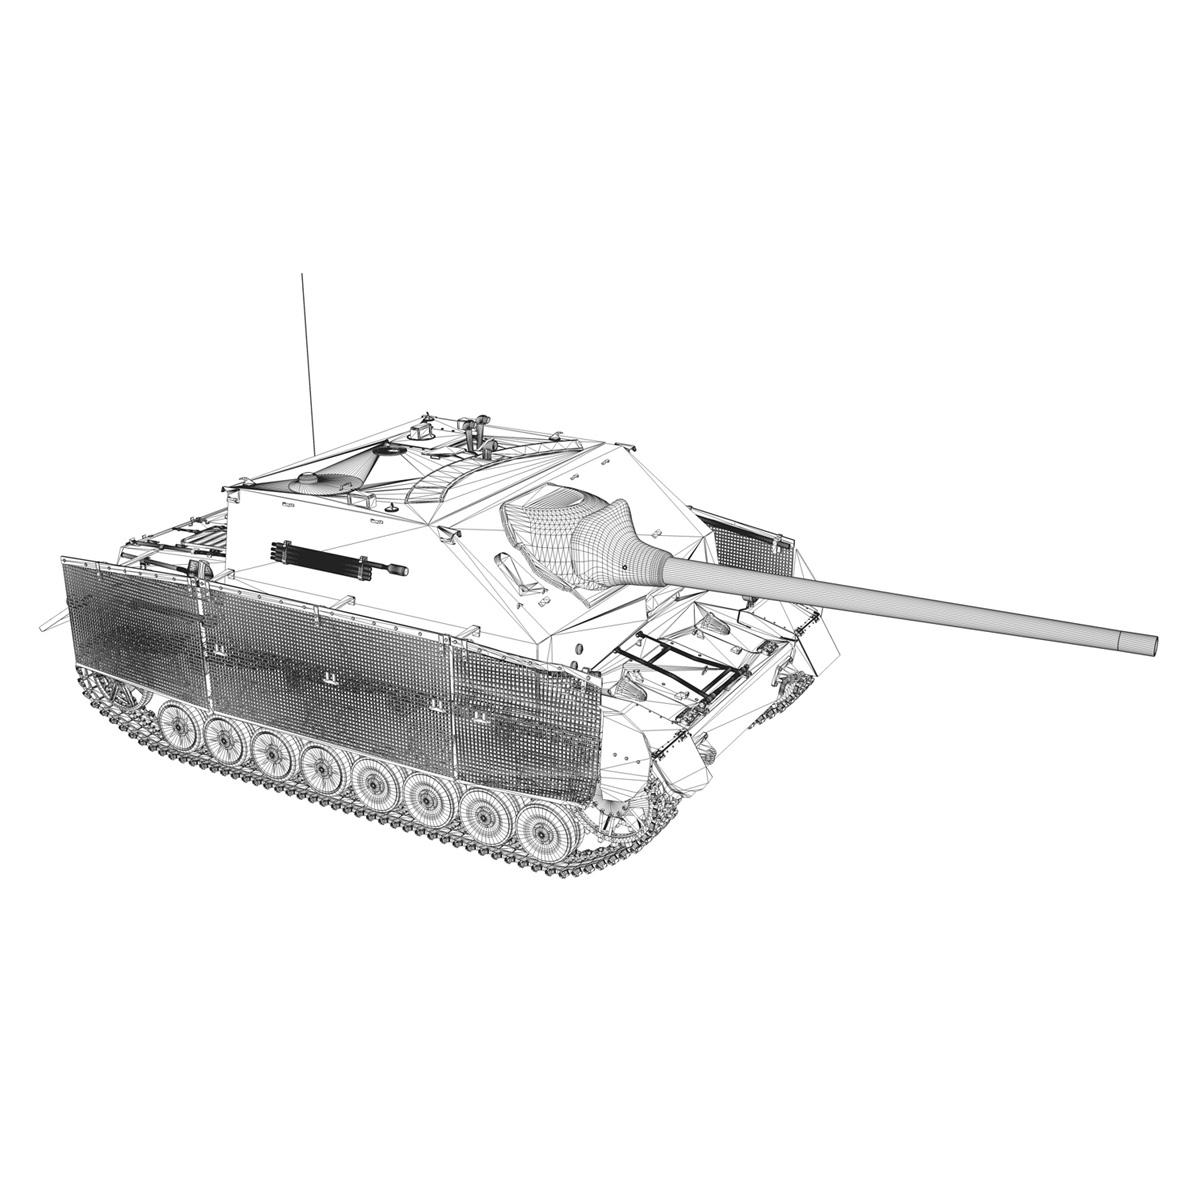 jagdpanzer iv l/70 (a) – sd.kfz 162/1 3d model 3ds fbx c4d lwo obj 202016